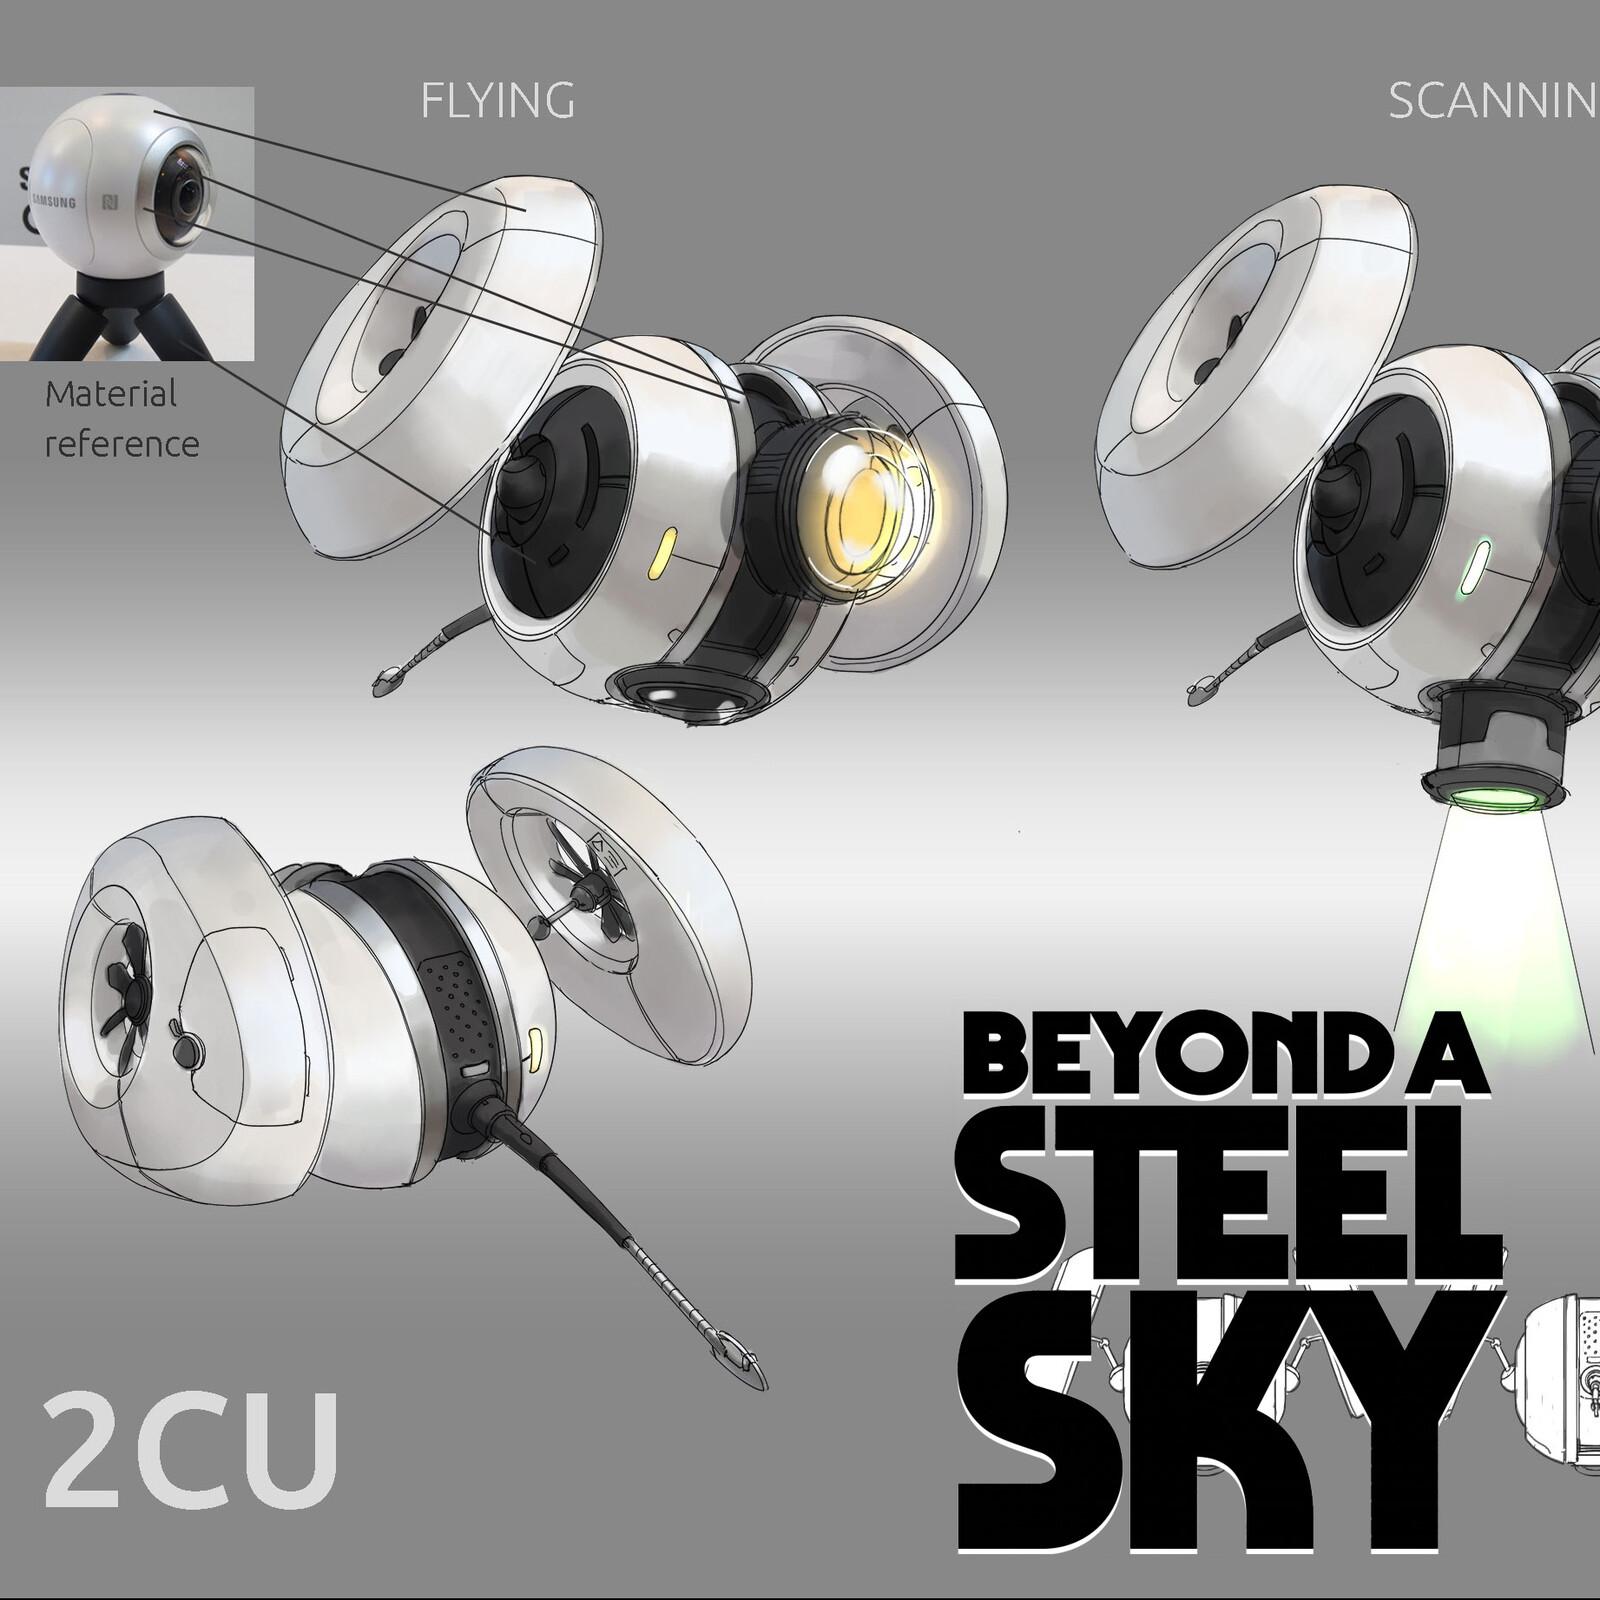 BEYOND A STEEL SKY: 2CU